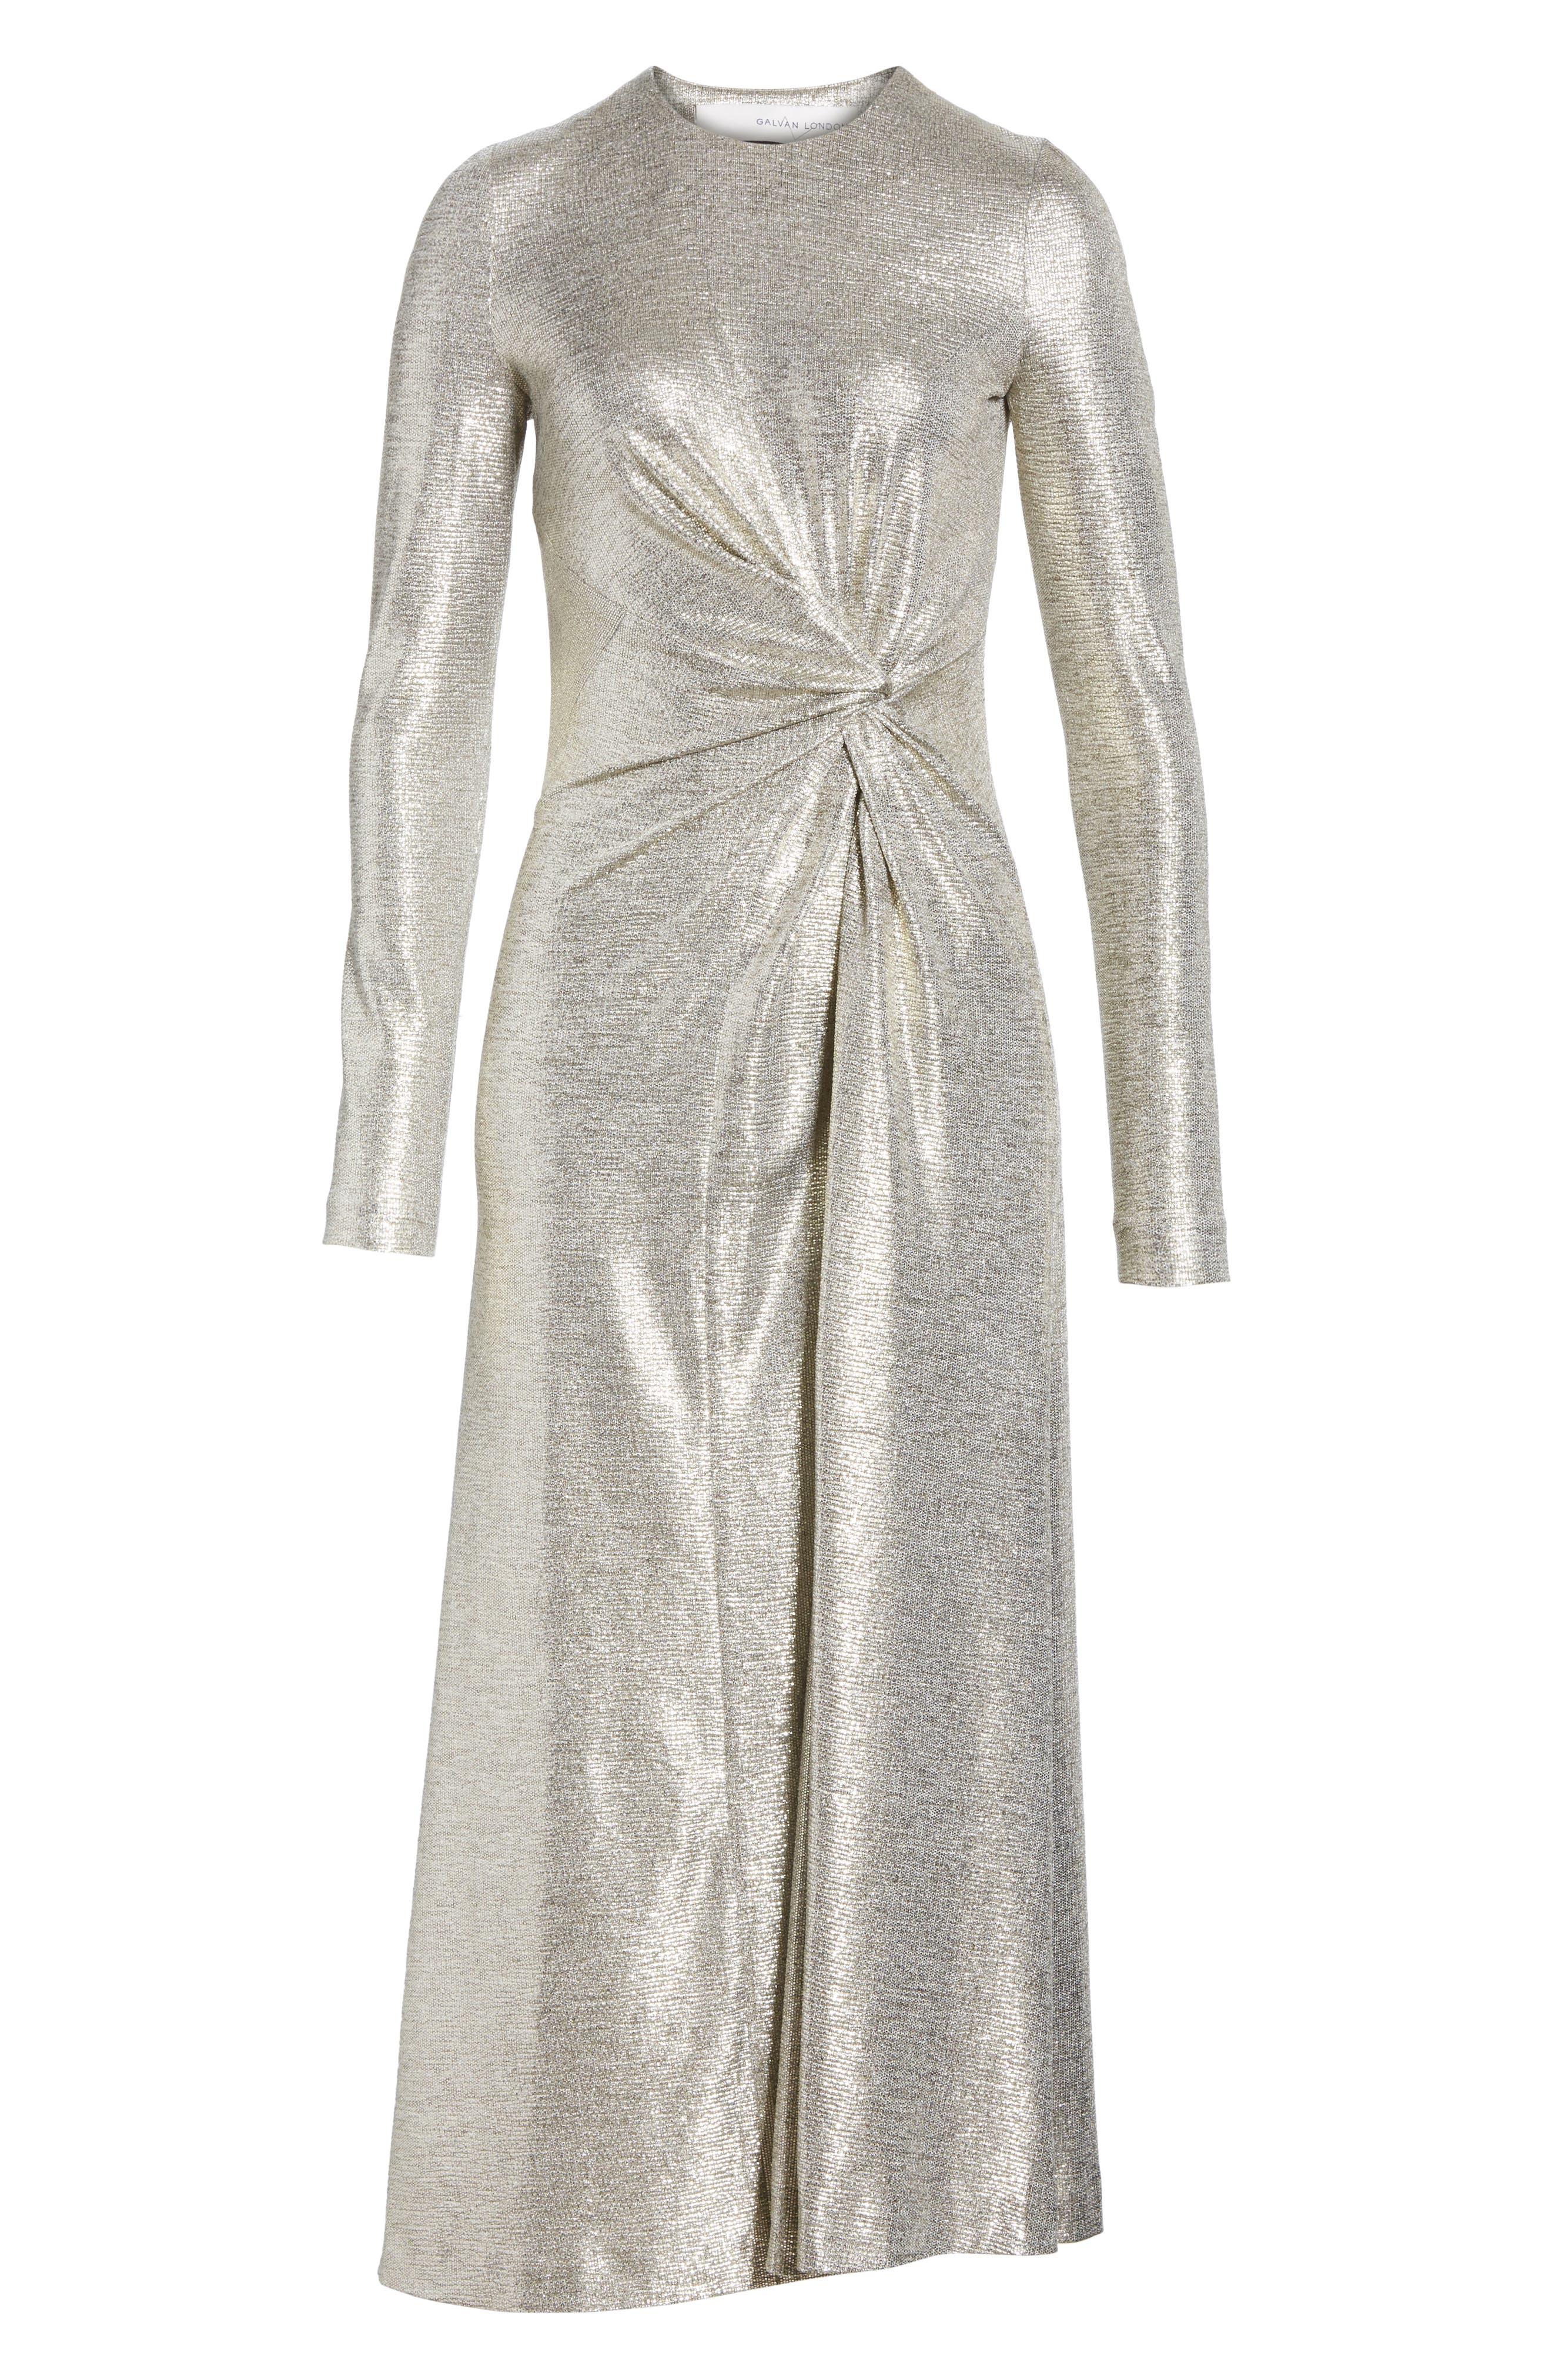 Twist Detail Metallic Dress,                             Alternate thumbnail 7, color,                             PLATINUM